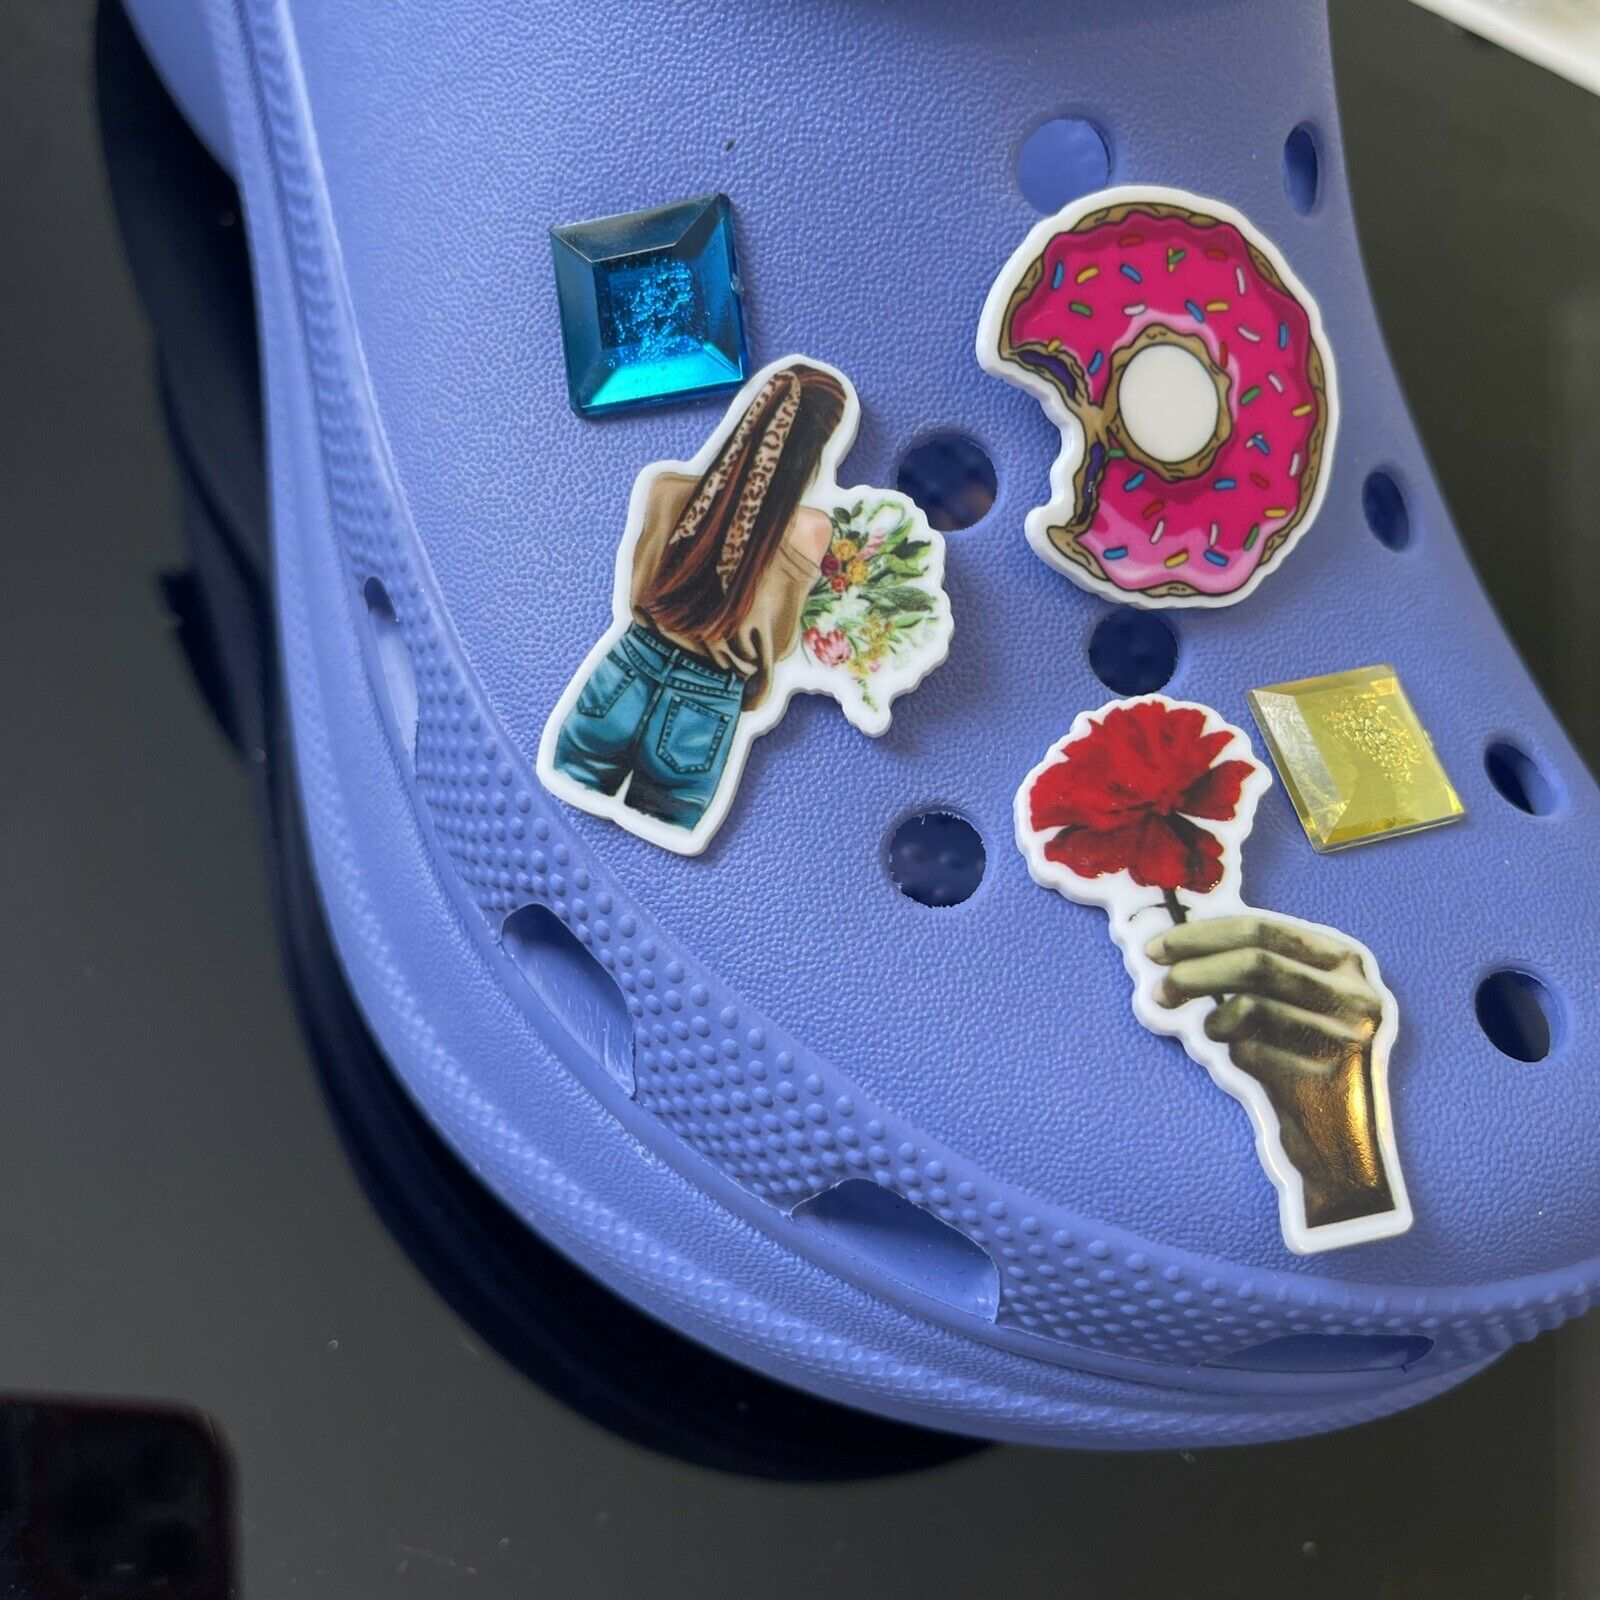 crocs inspired charms - Set Of 5 Charms